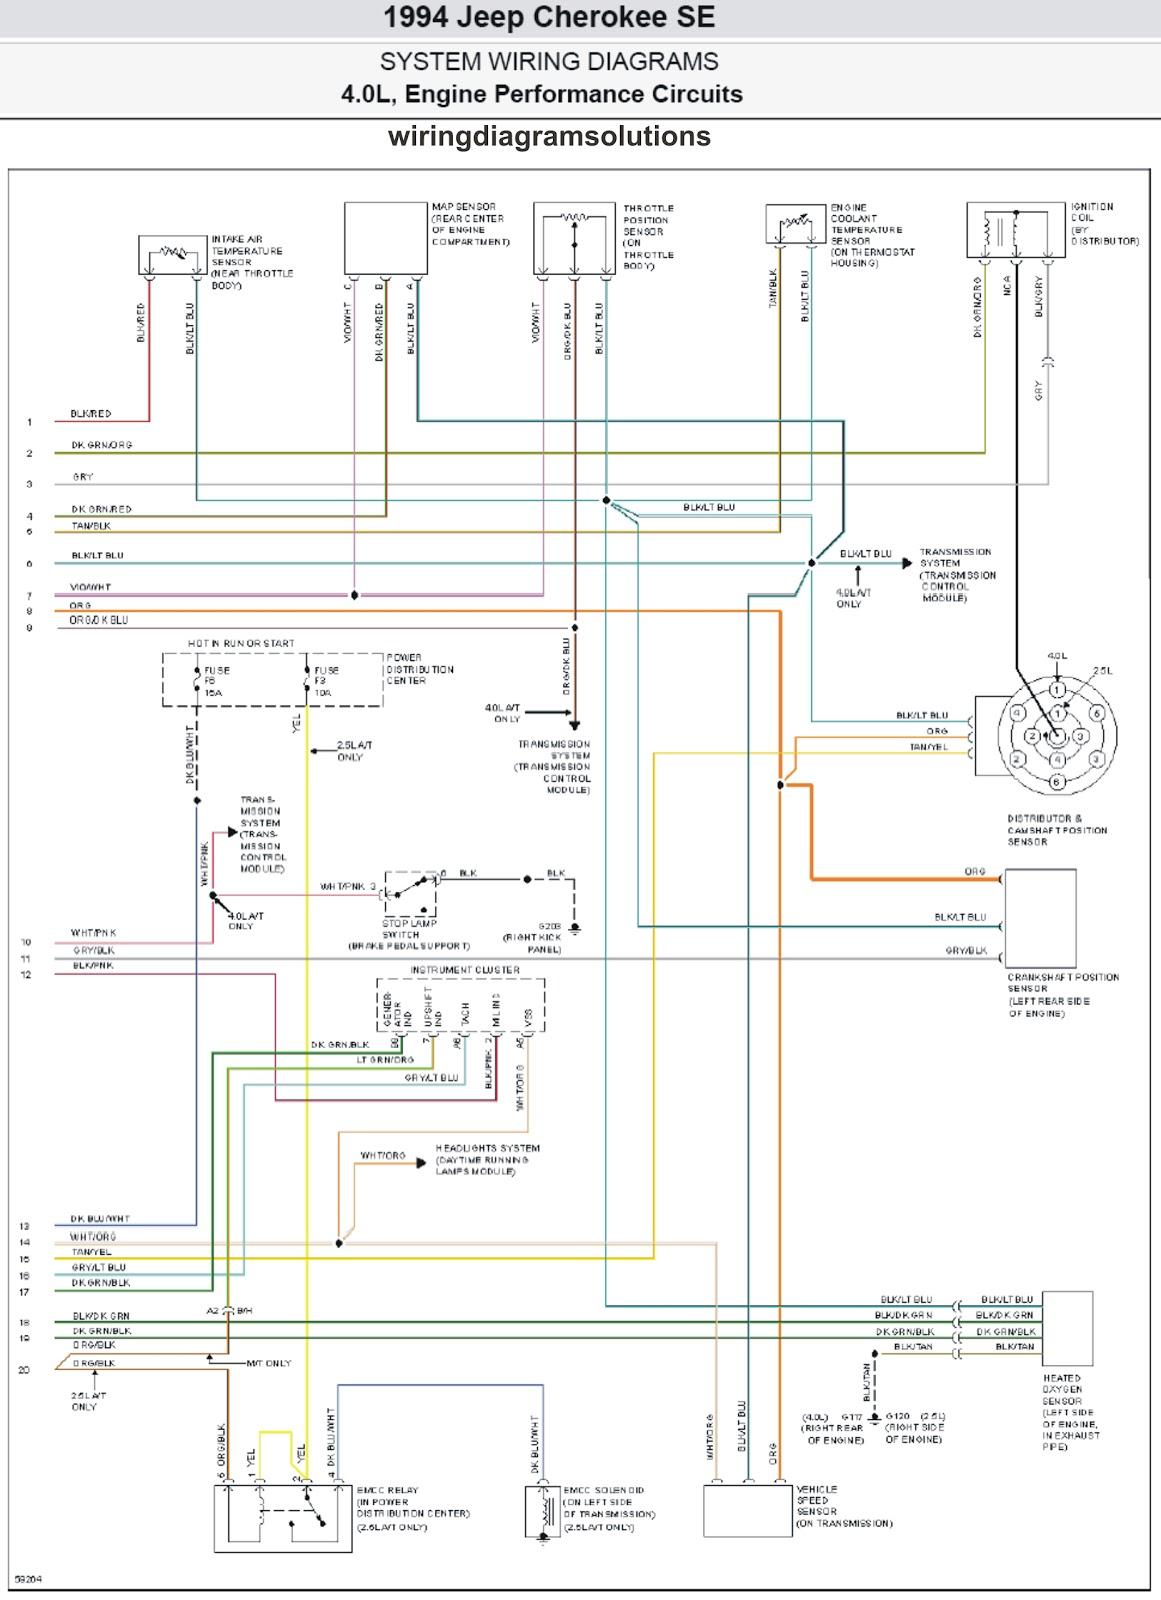 Diagram Audio Wiring Diagram For 1994 Jeep Cherokee Full Version Hd Quality Jeep Cherokee Ritualdiagrams Politopendays It